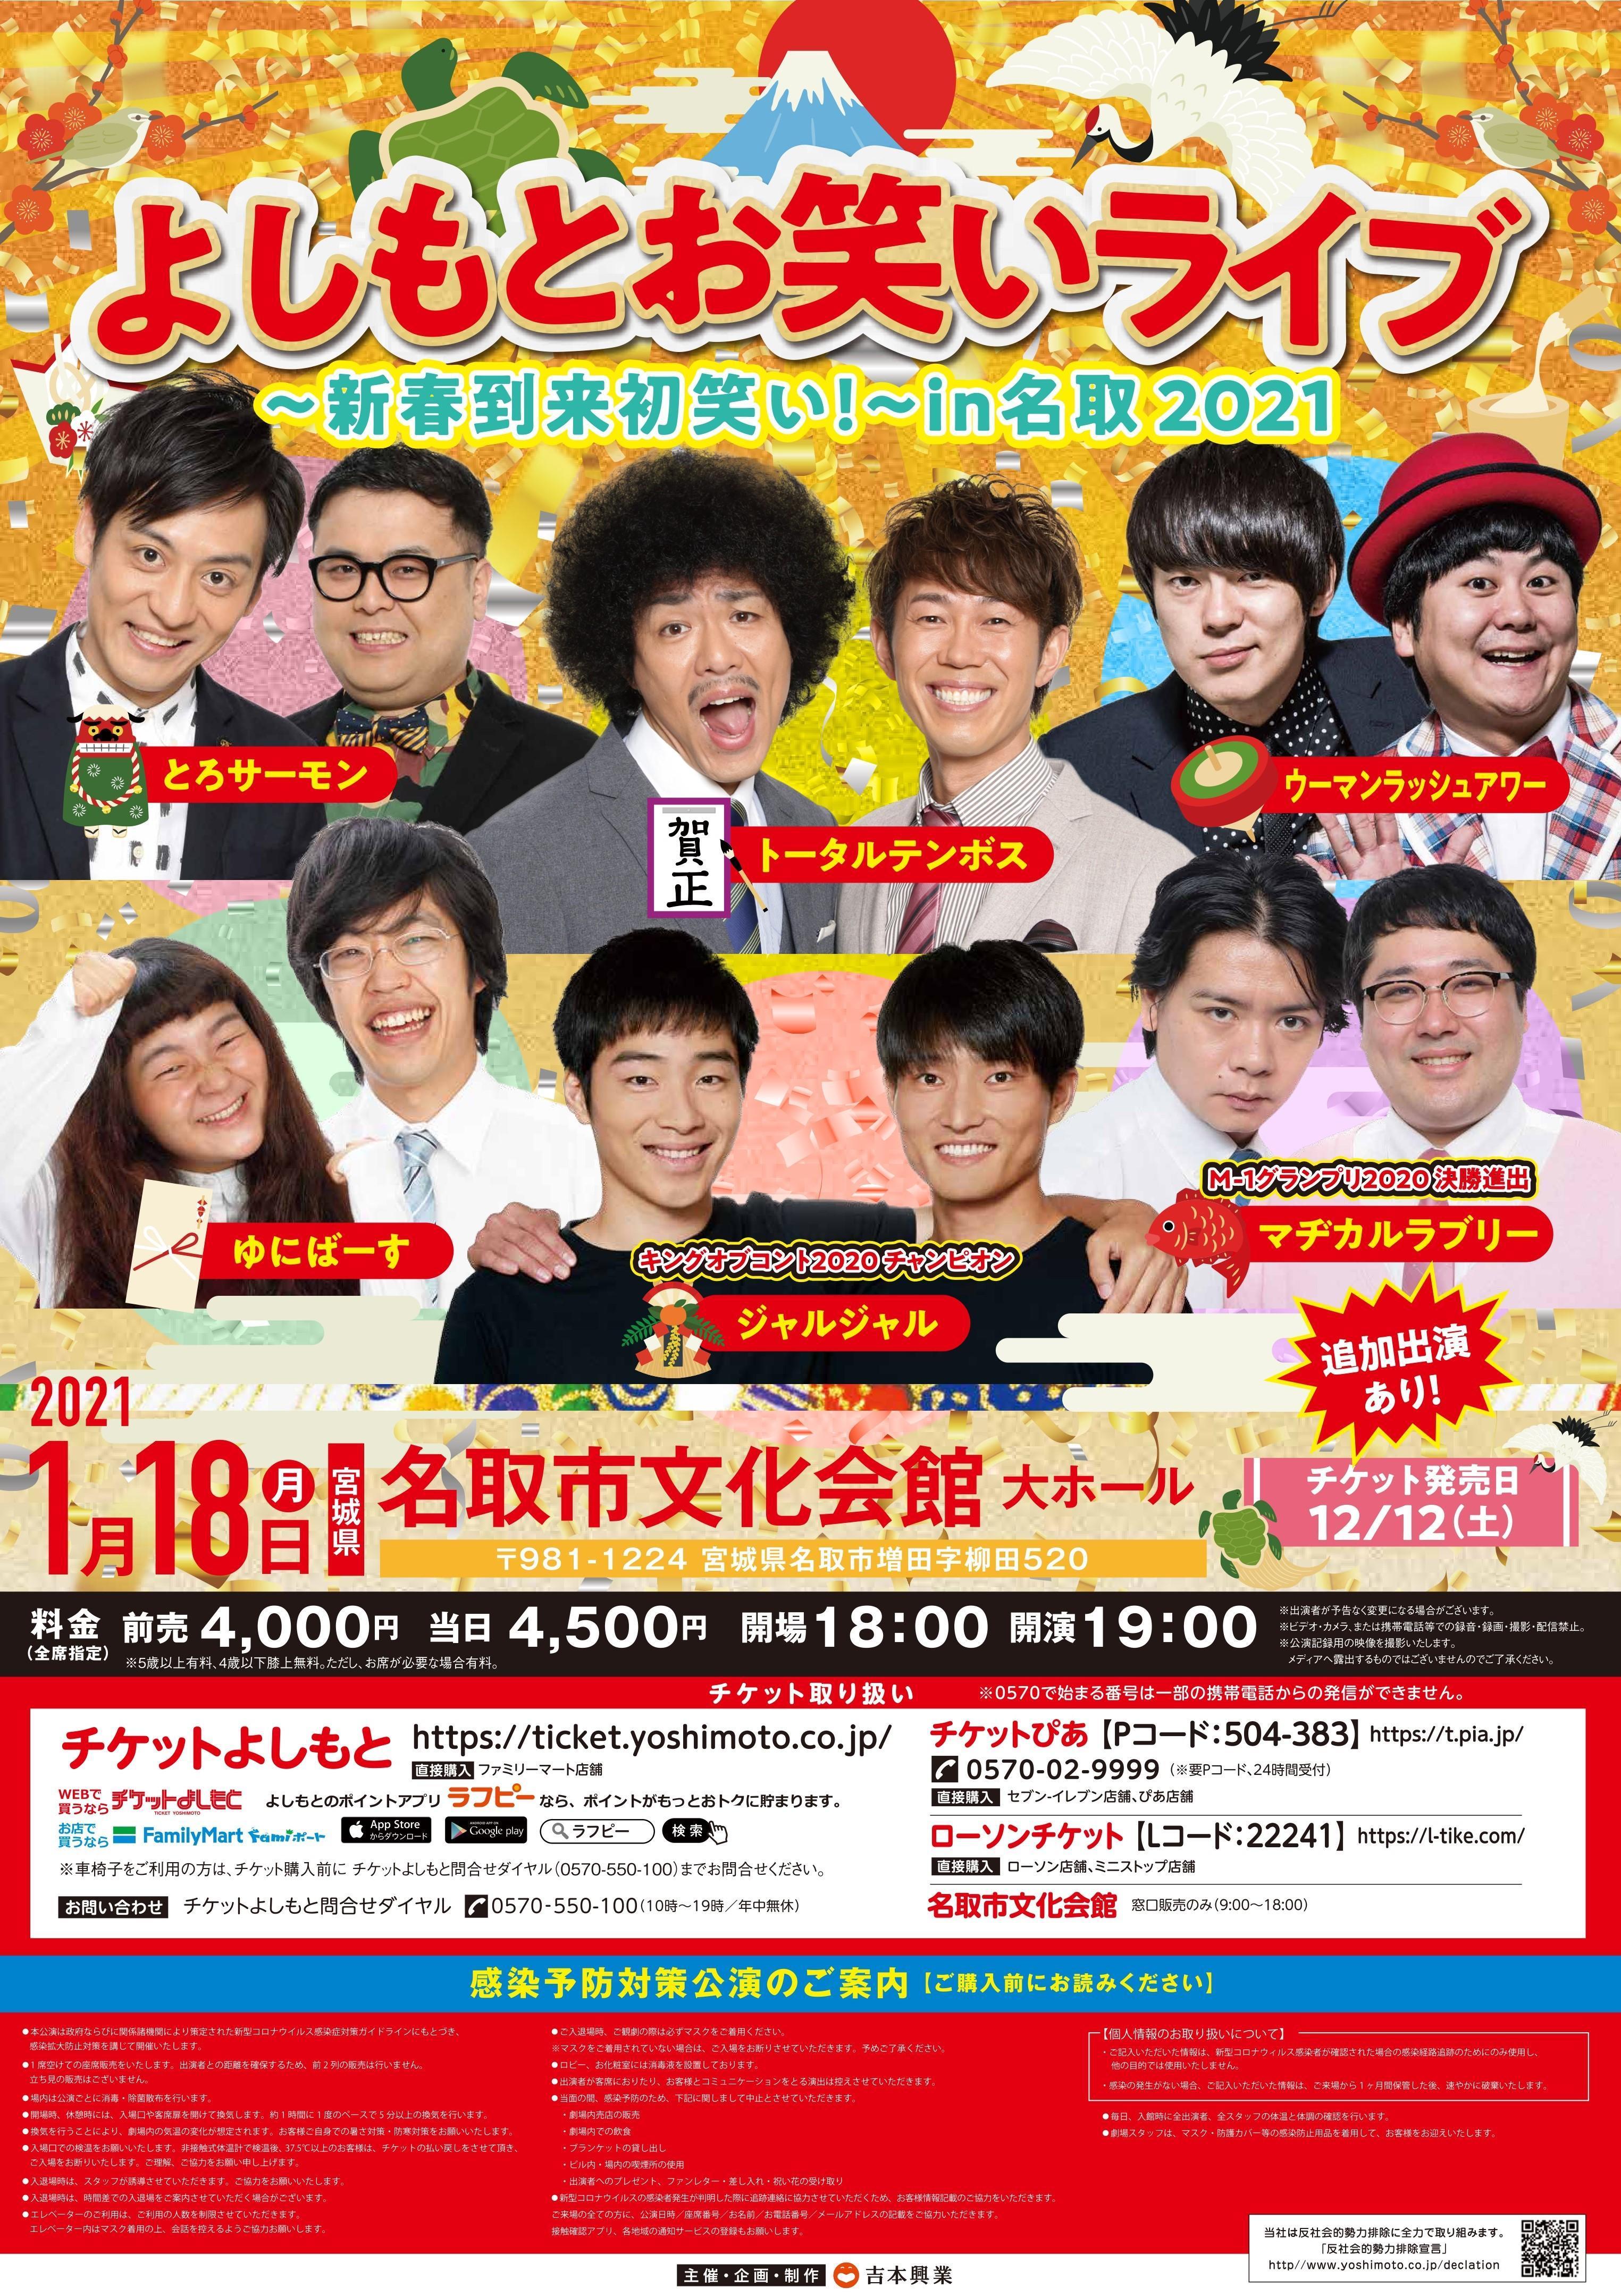 http://www.syumatsu.jp/20201208104719-459067a29f4245f11ac4a985af0bf905ca84d9fa.jpg